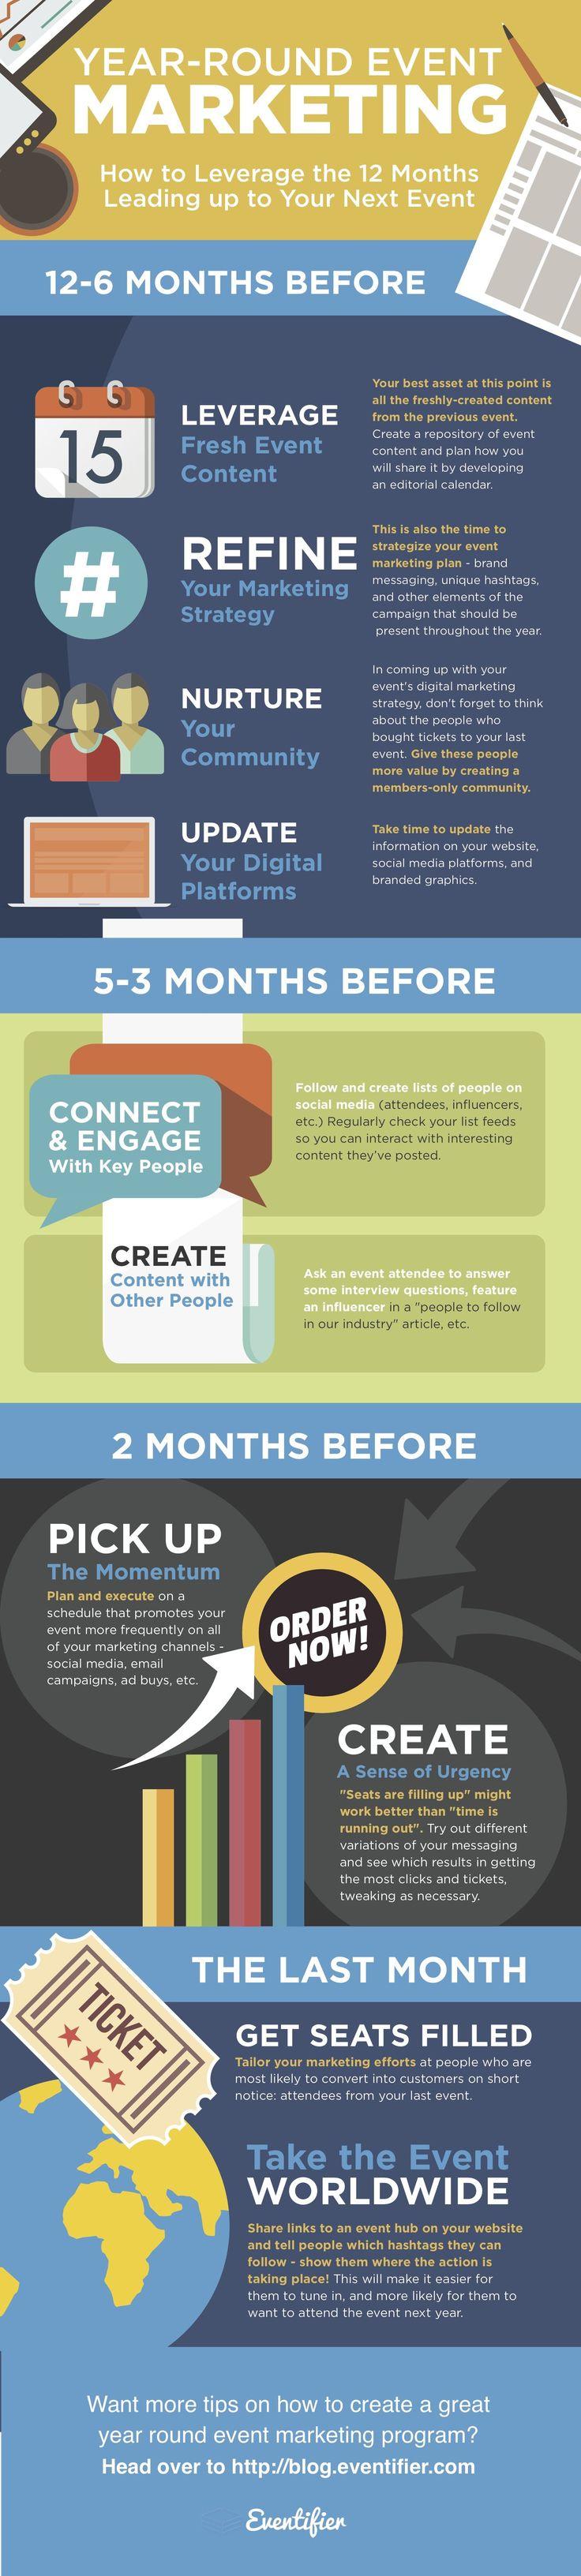 Year-Round Event Marketing #infographic #EventMarketing #Marketing